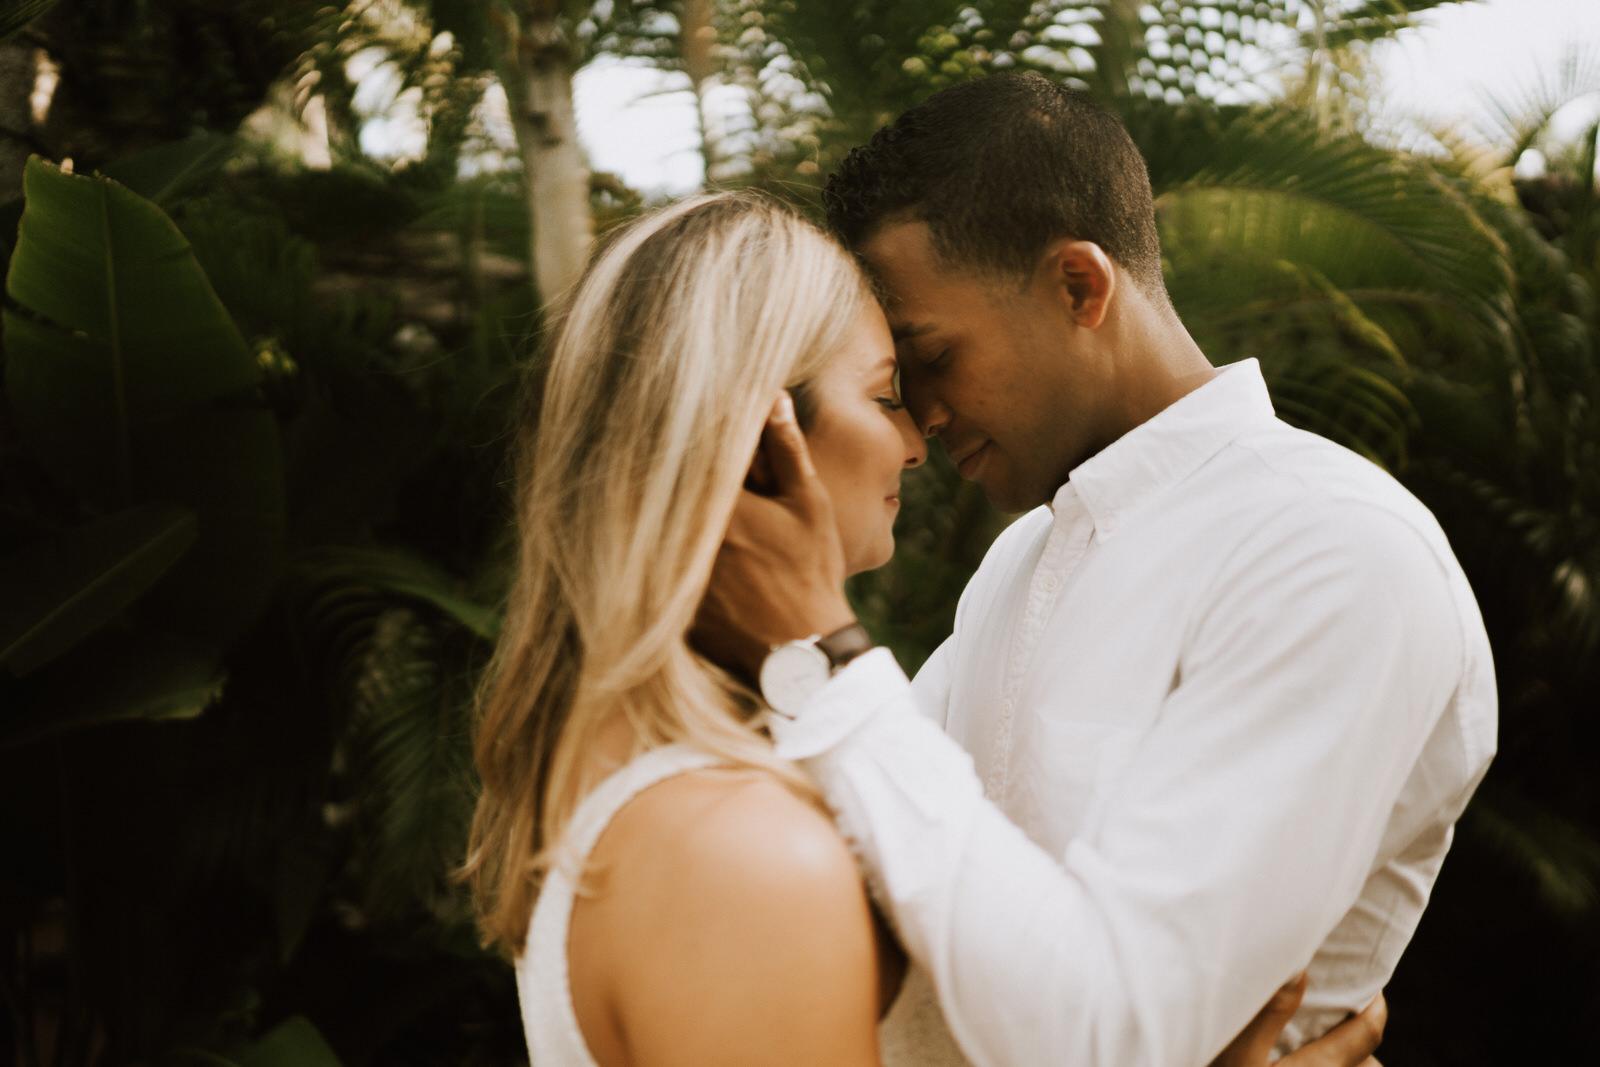 Naples 5th Ave Engagement Photos- Michelle Gonzalez Photography- Michele + Troy-50.JPG